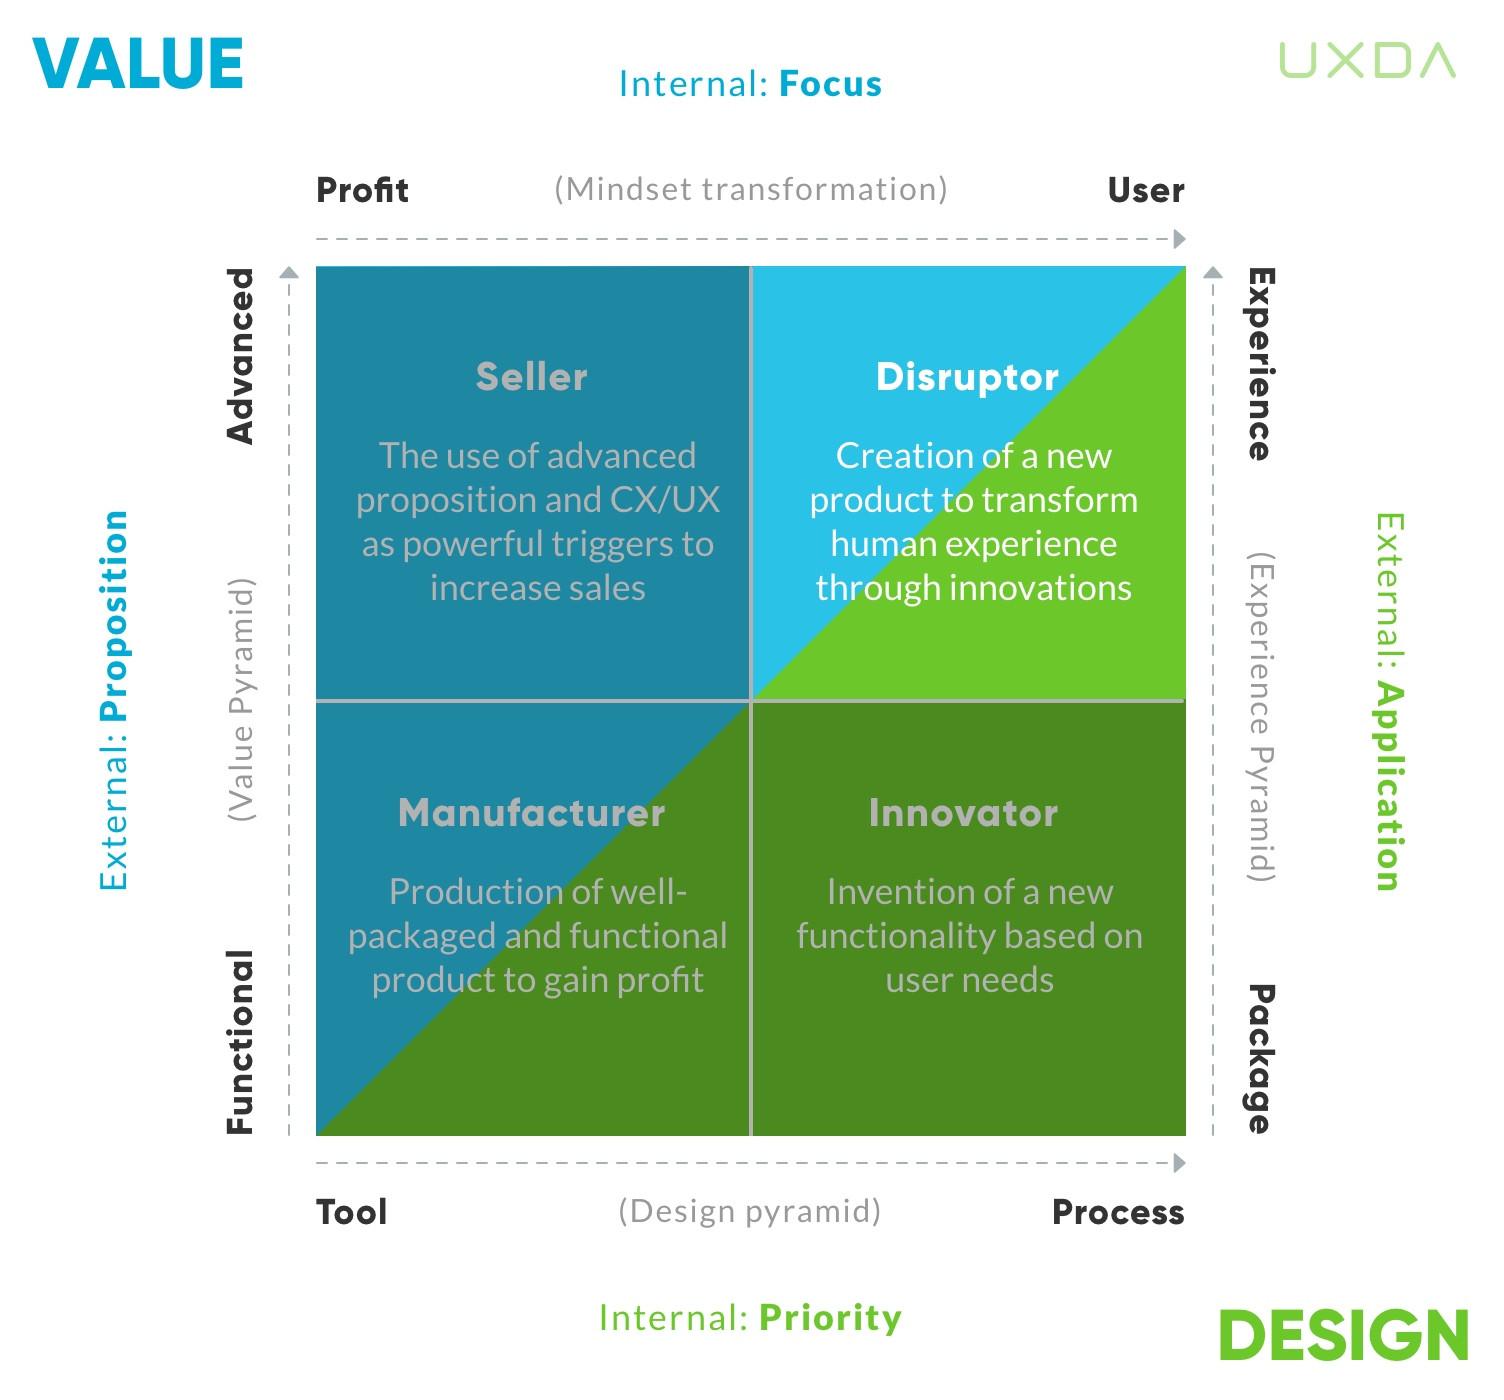 financial-design-matrix-for-banking-disruption-16__1504.jpg